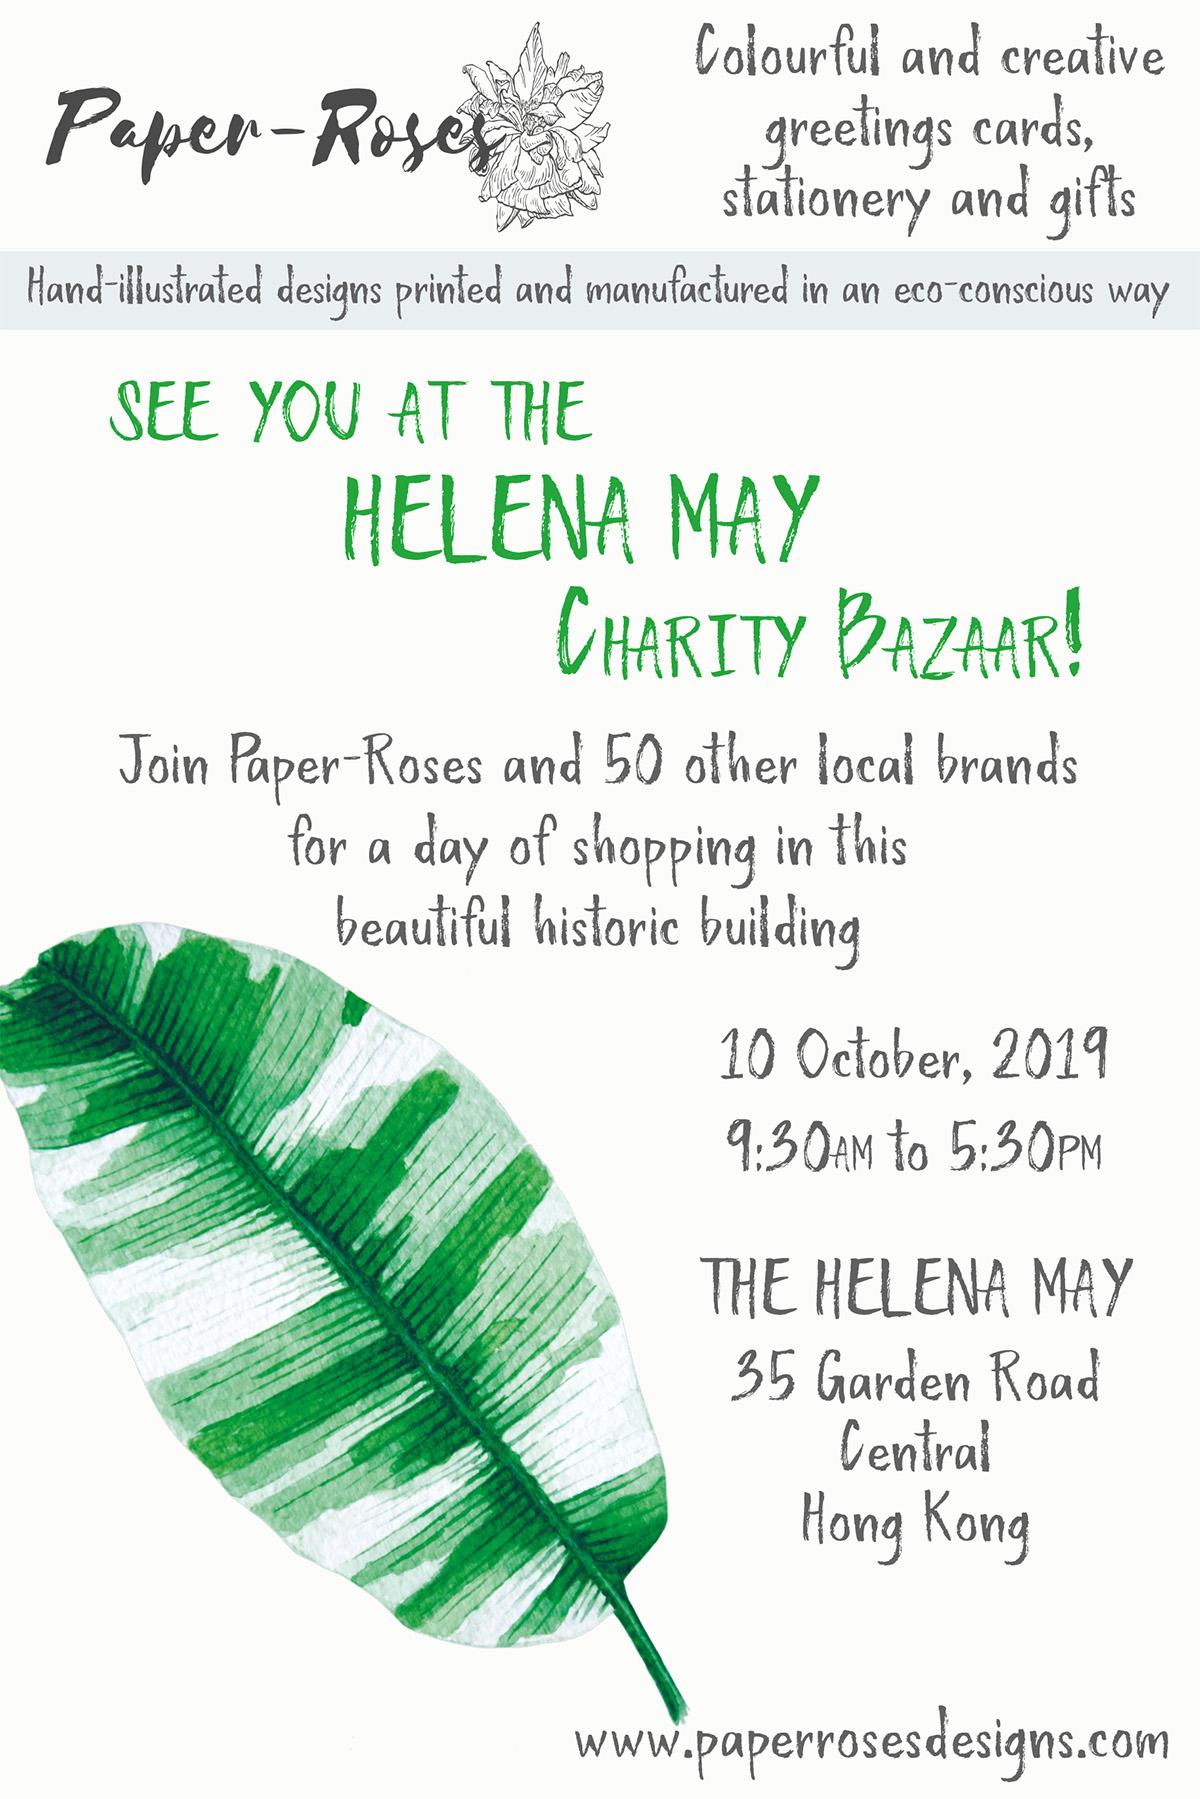 Paper-Roses | Events | Helena May Charity Bazaar | 10 October 2019